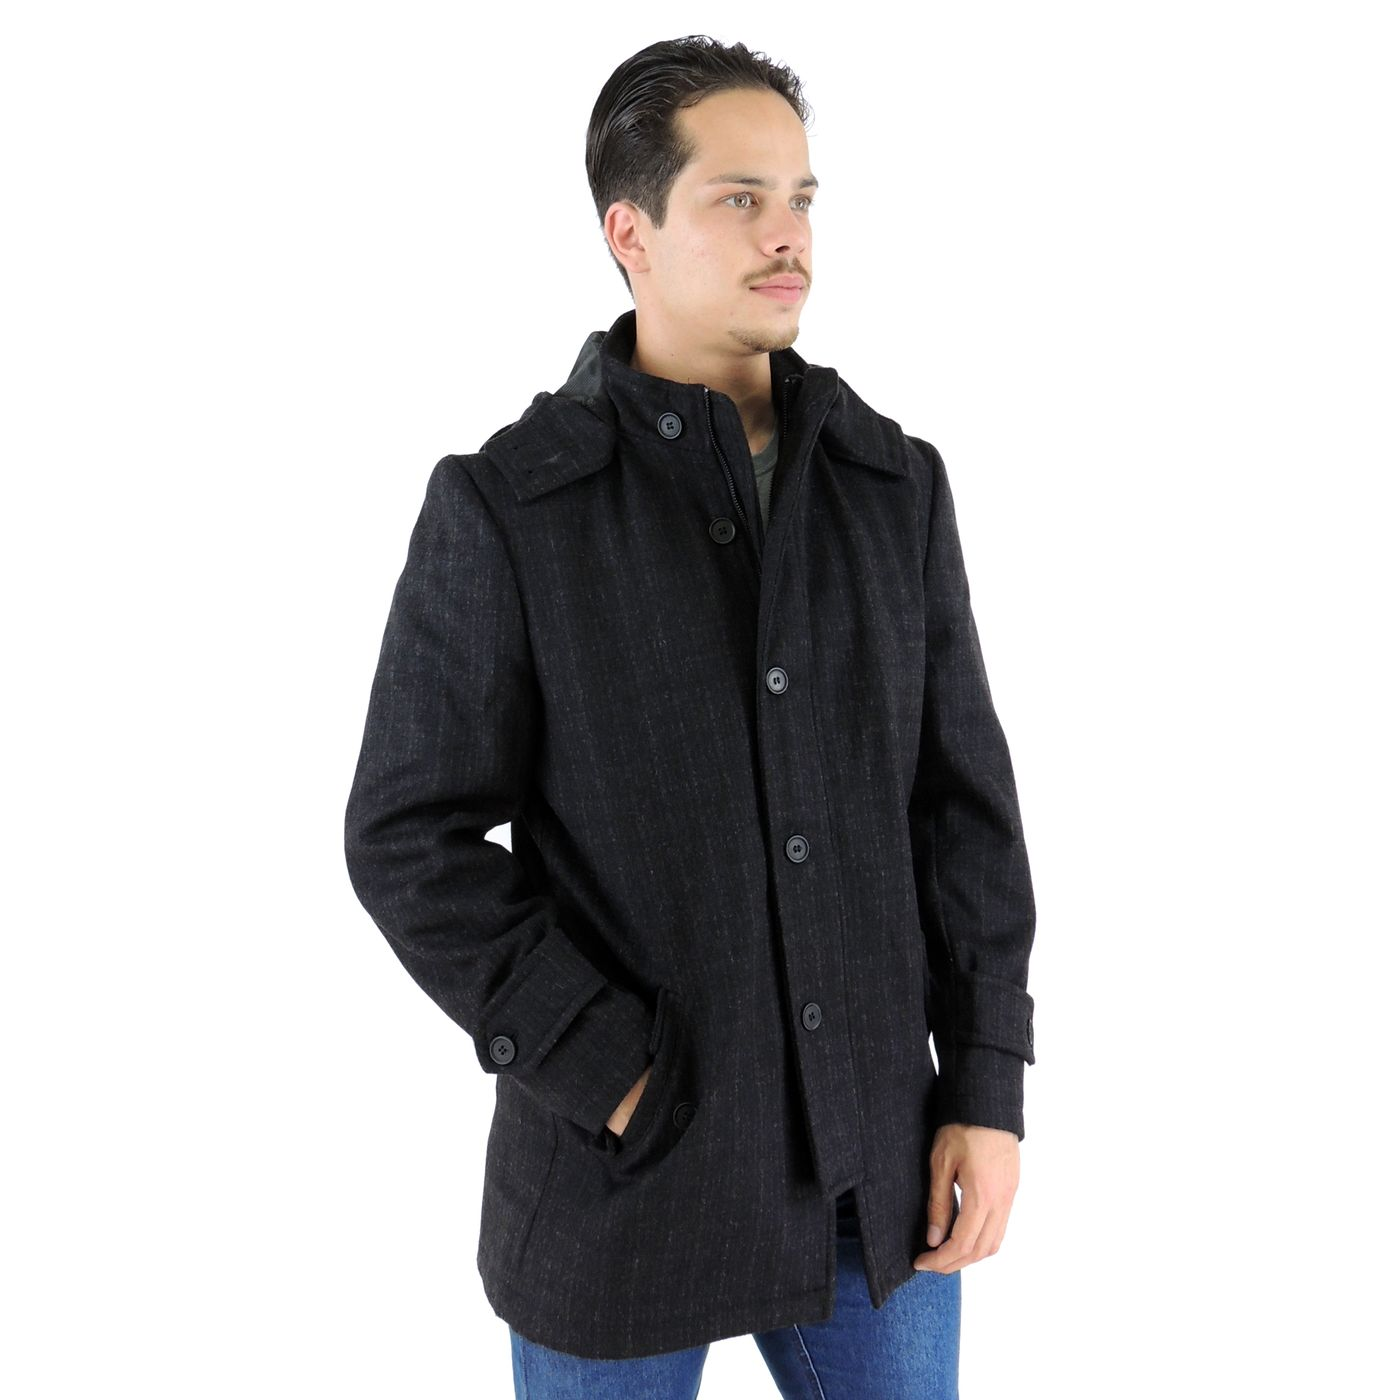 Casaco Longo Masculino Cinza em lã uruguaia para o inverno - fieroshop 75c4f61340119